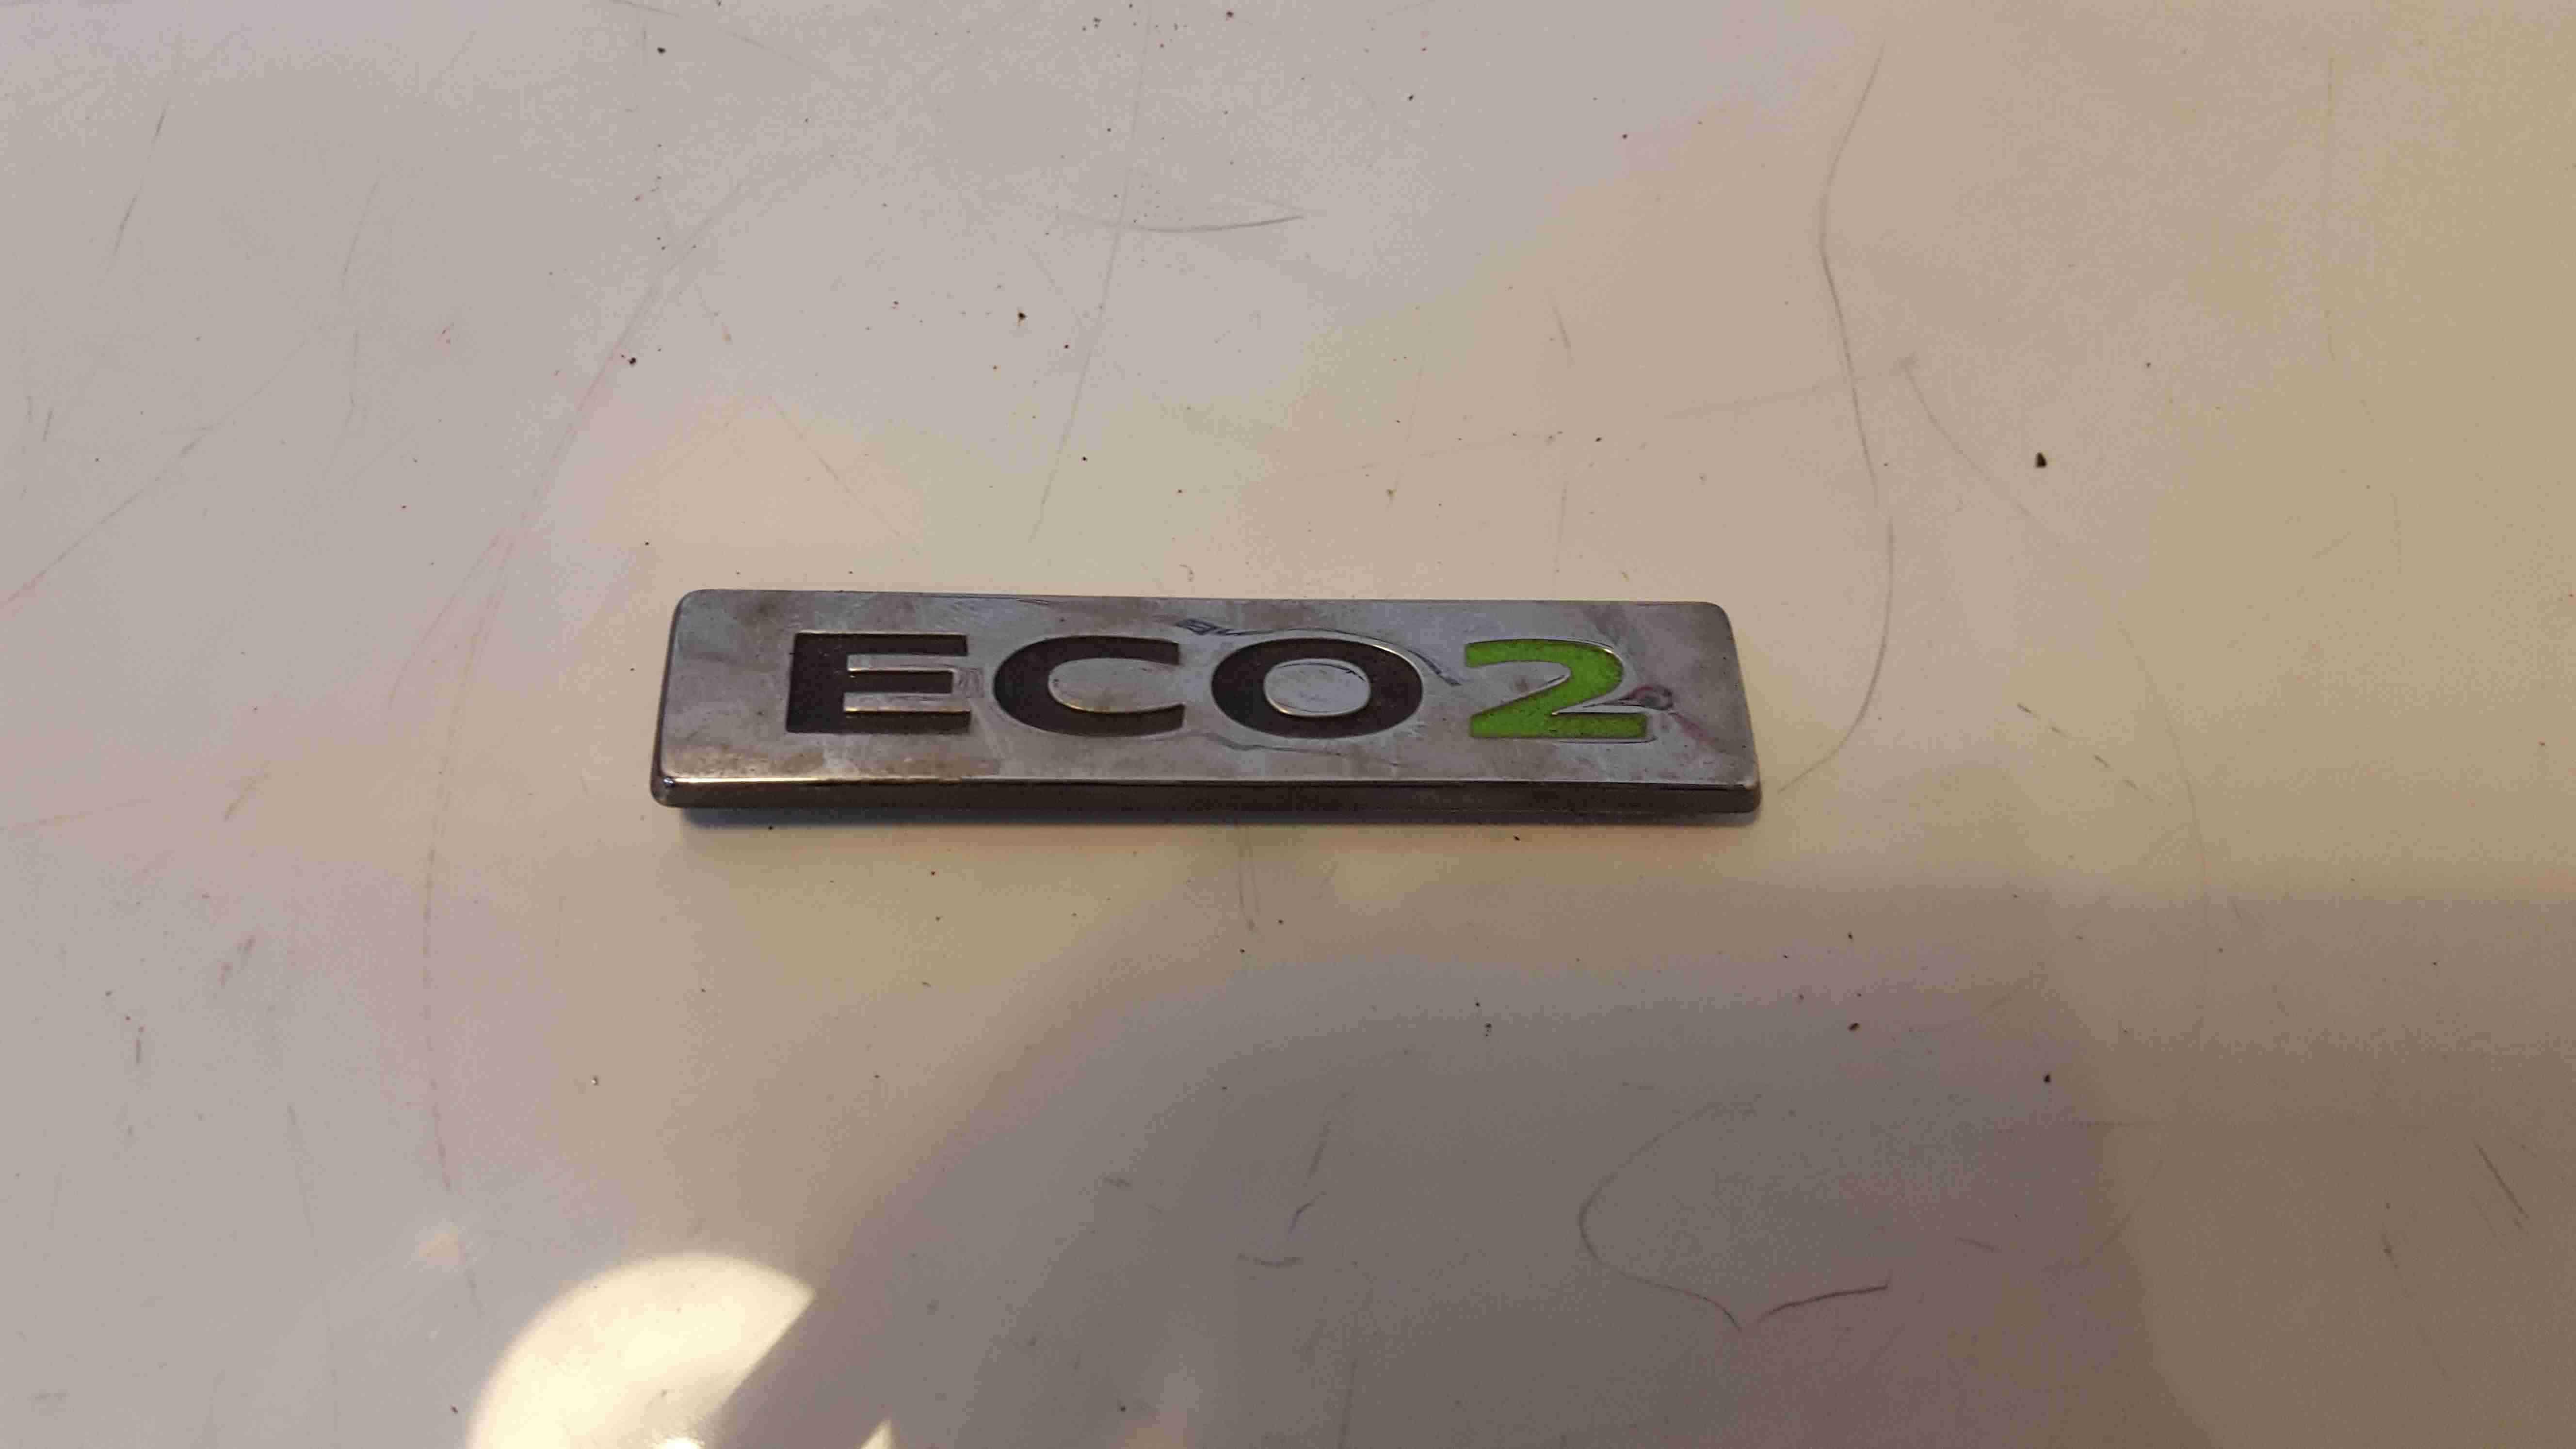 Renault Kadjar 2015-2018 Eco 2 Boot Letters